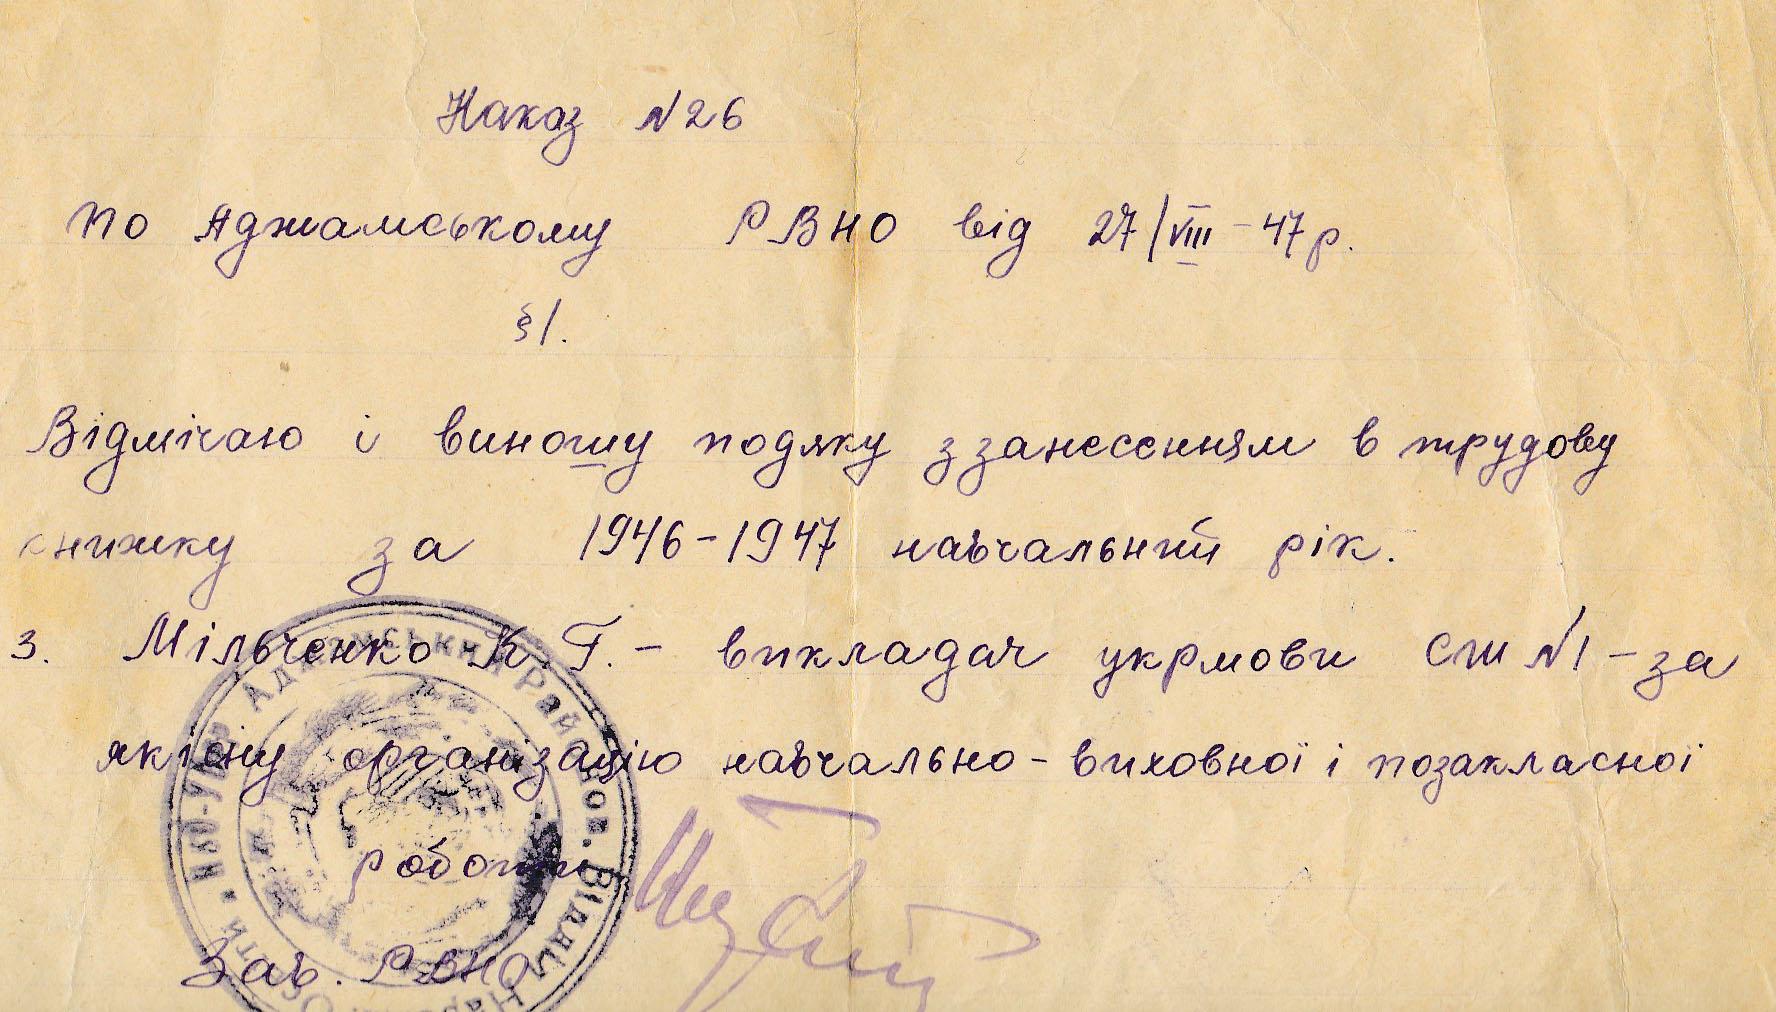 Приказ №26 на украинском языке. 197 год.